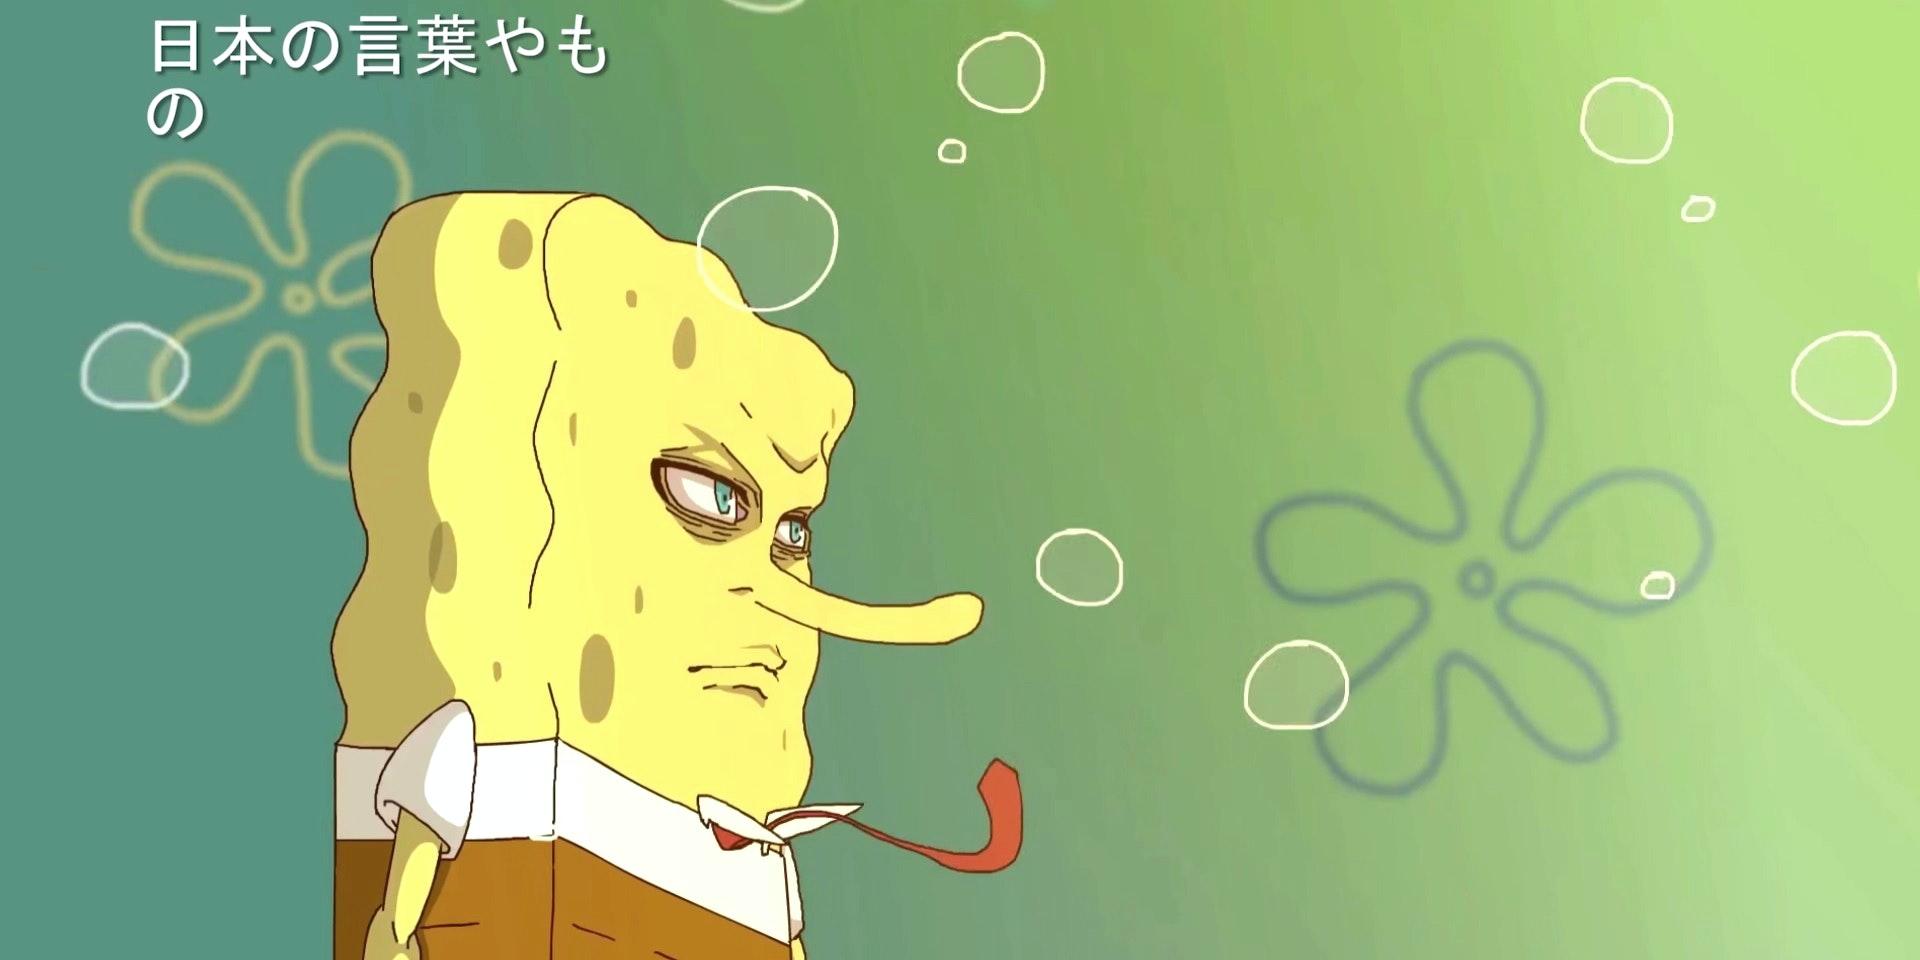 Watch This Violent Anime-Inspired 'SpongeBob SquarePants' Opening